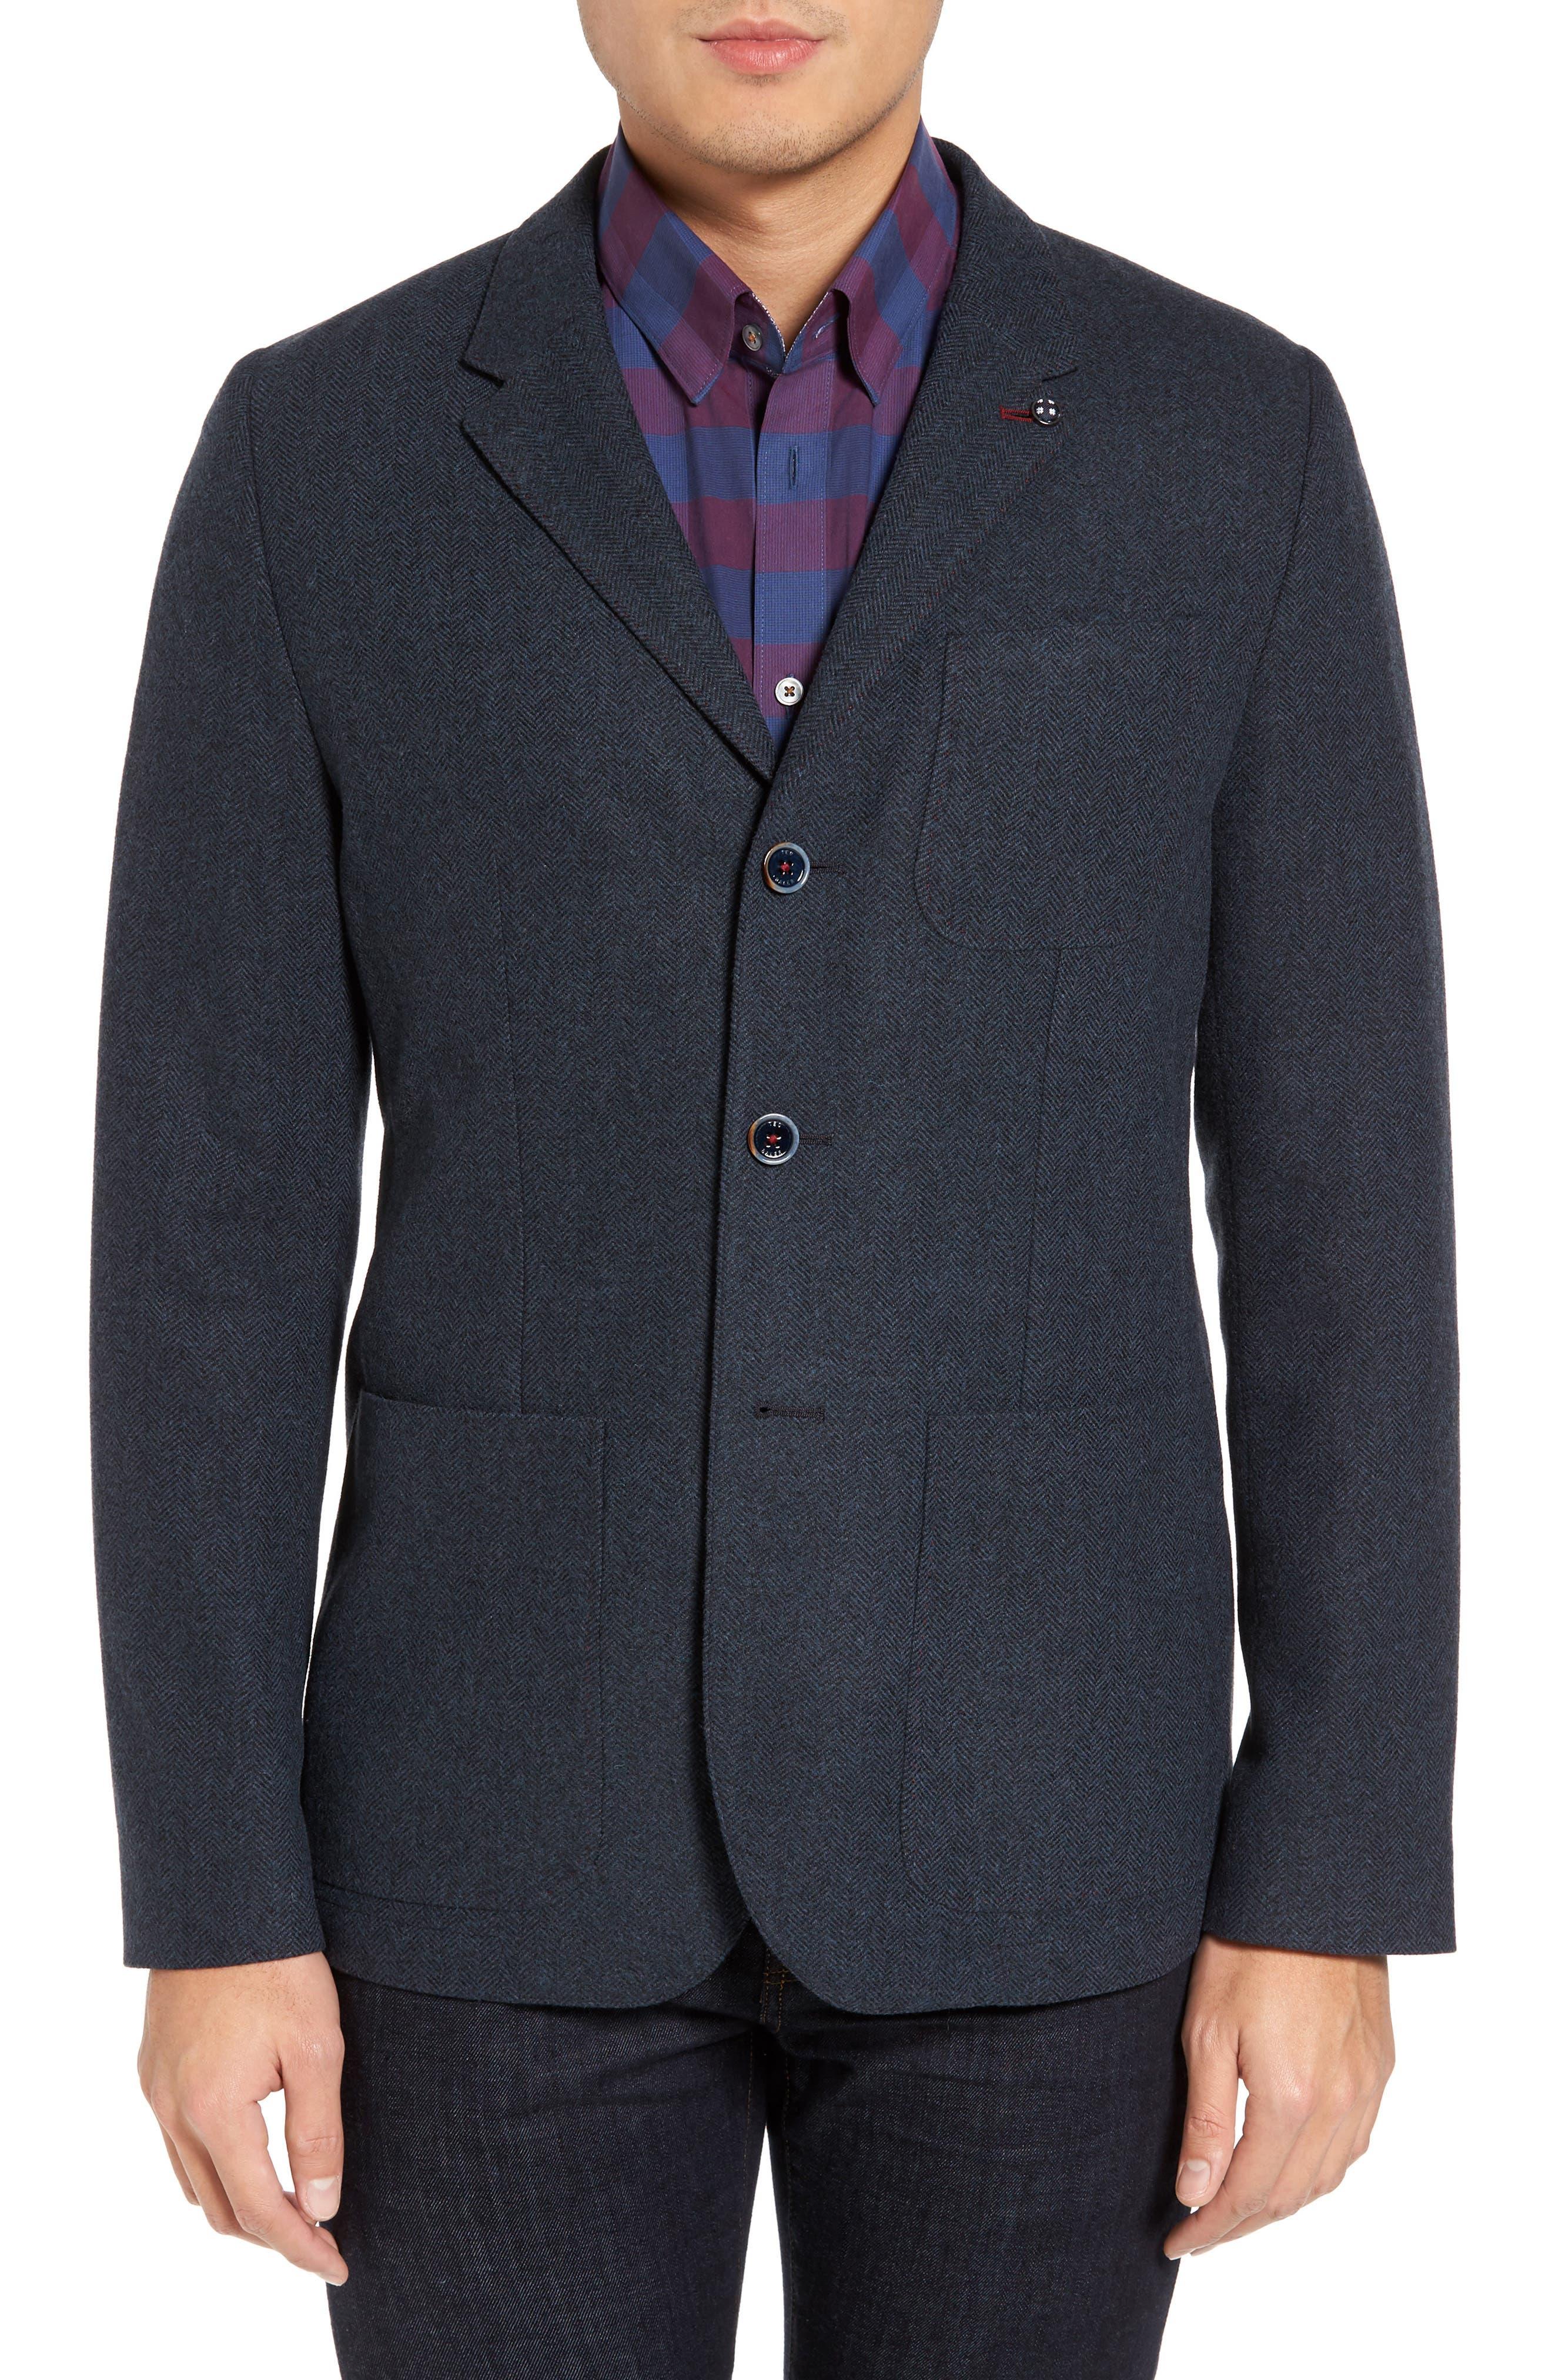 Porter Herringbone Wool Blend Jacket,                             Main thumbnail 1, color,                             410